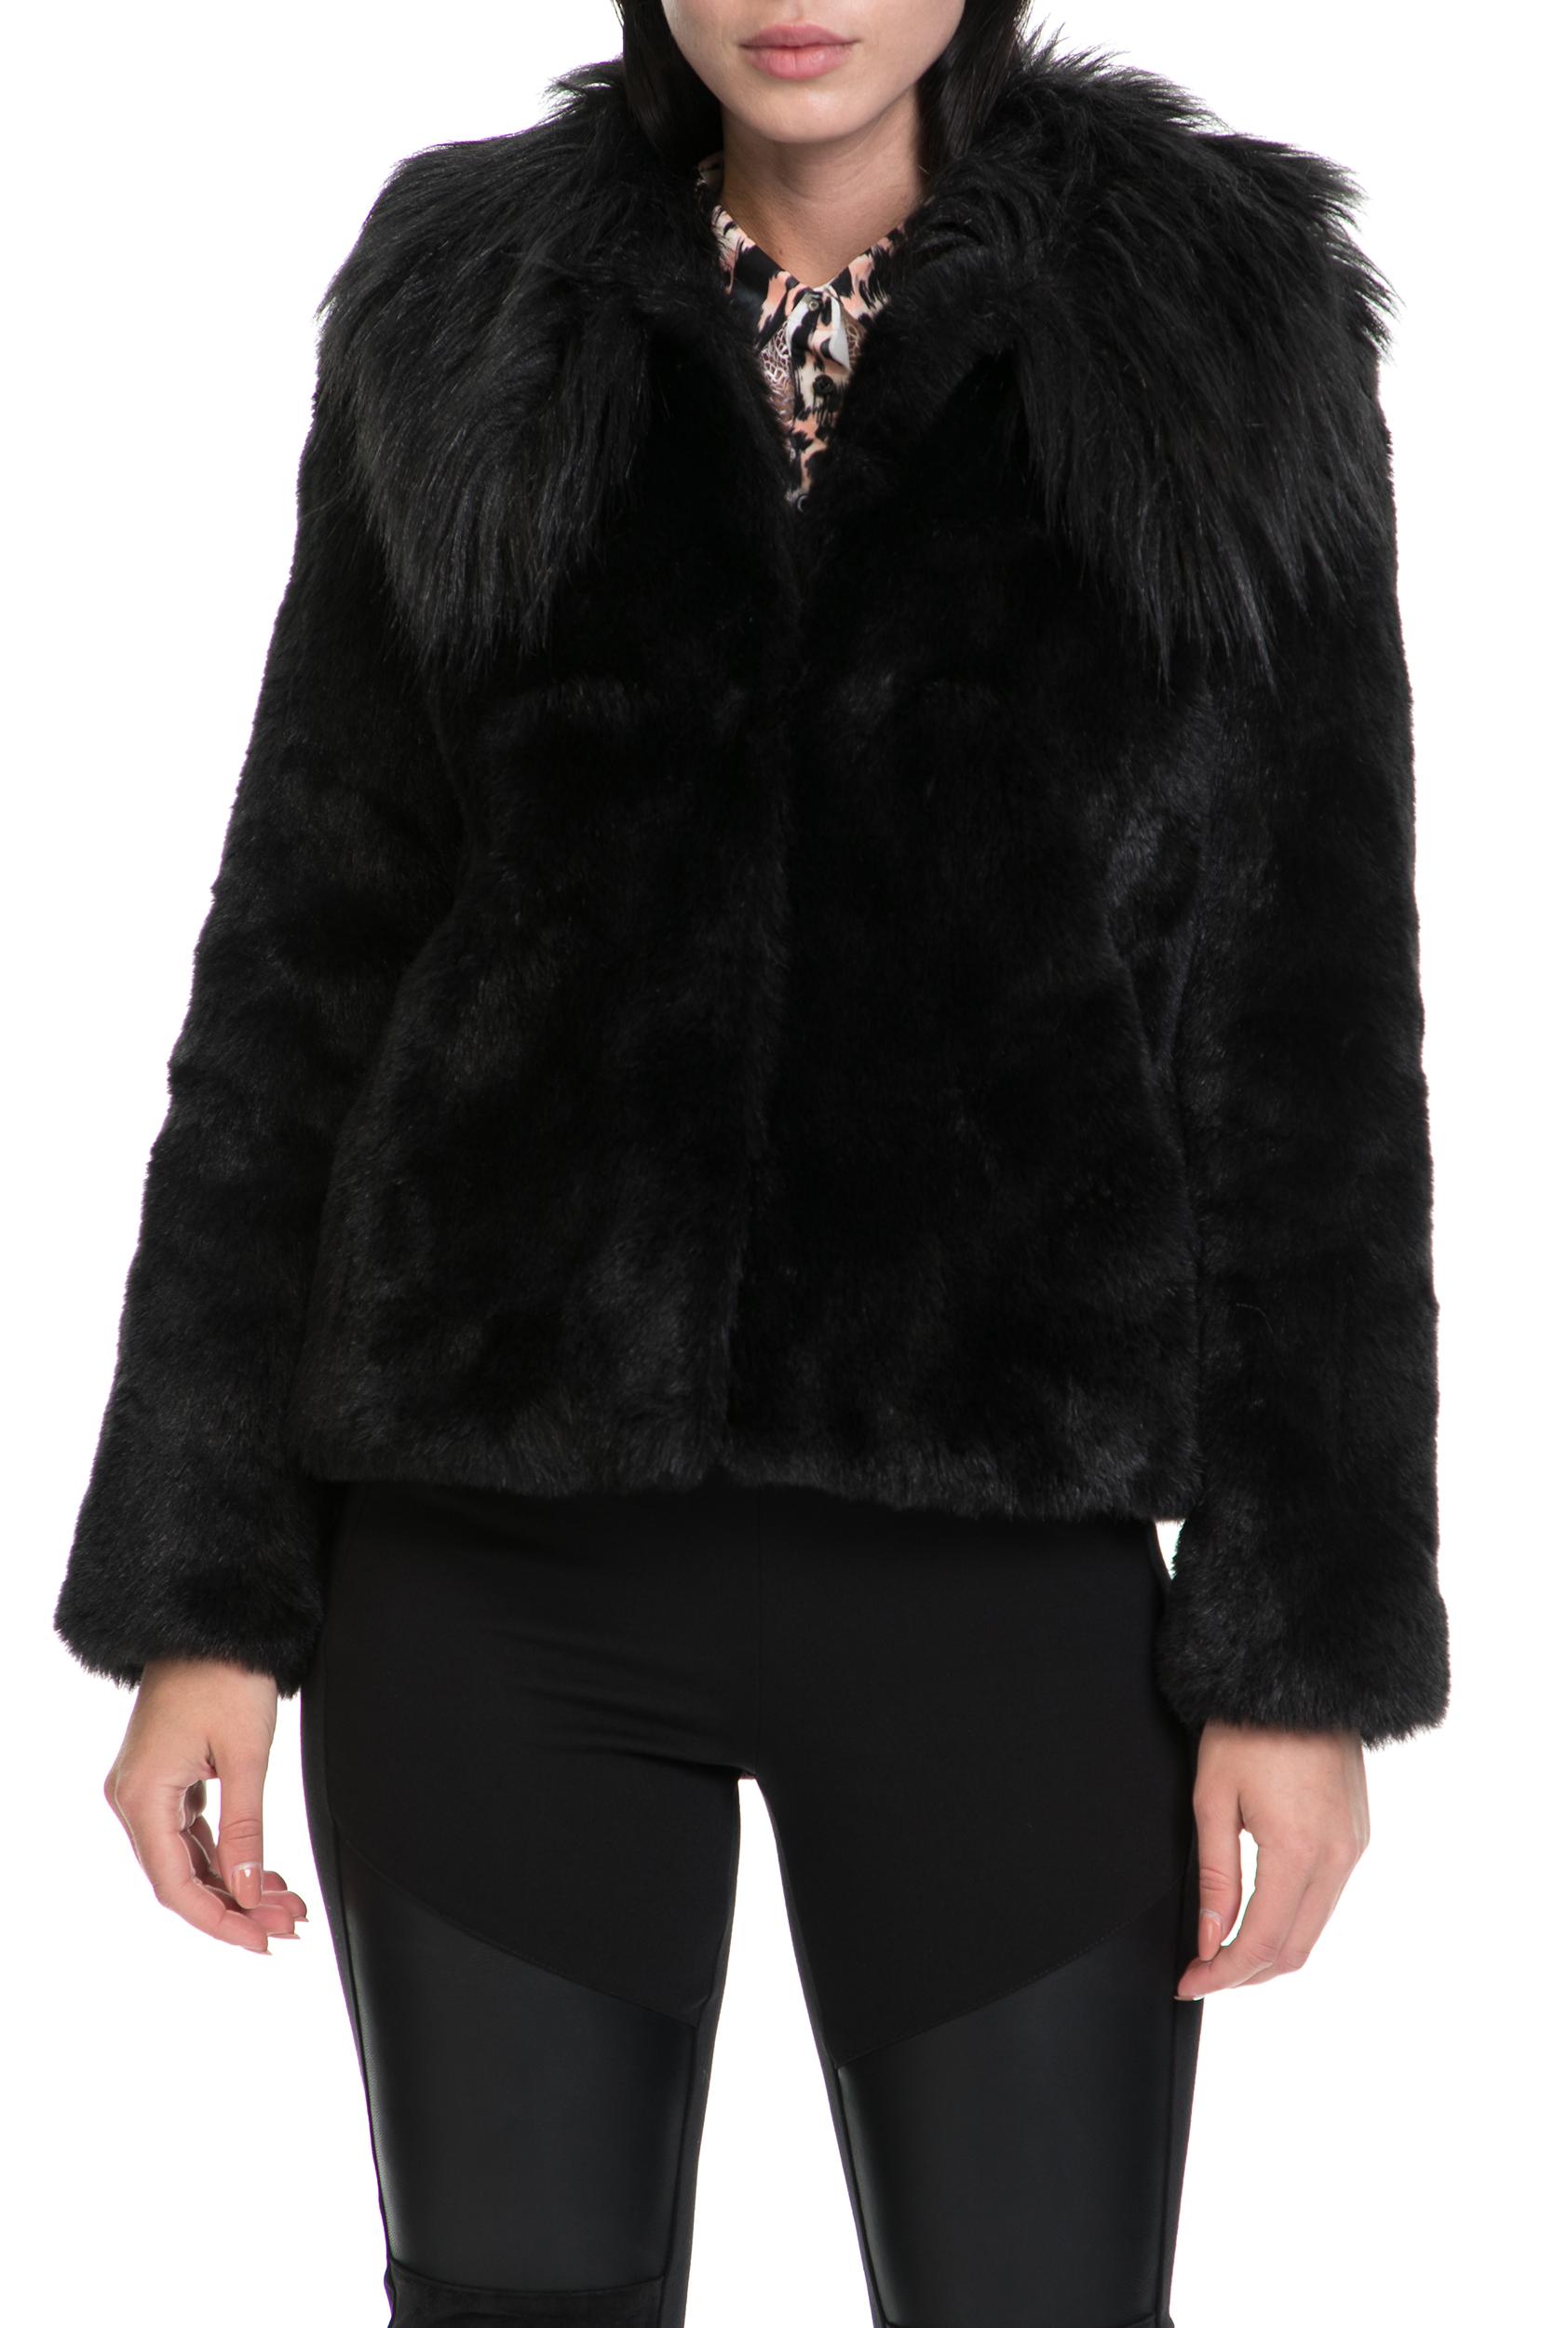 GUESS – Γυναικείο παλτό AGATA GUESS μαύρο